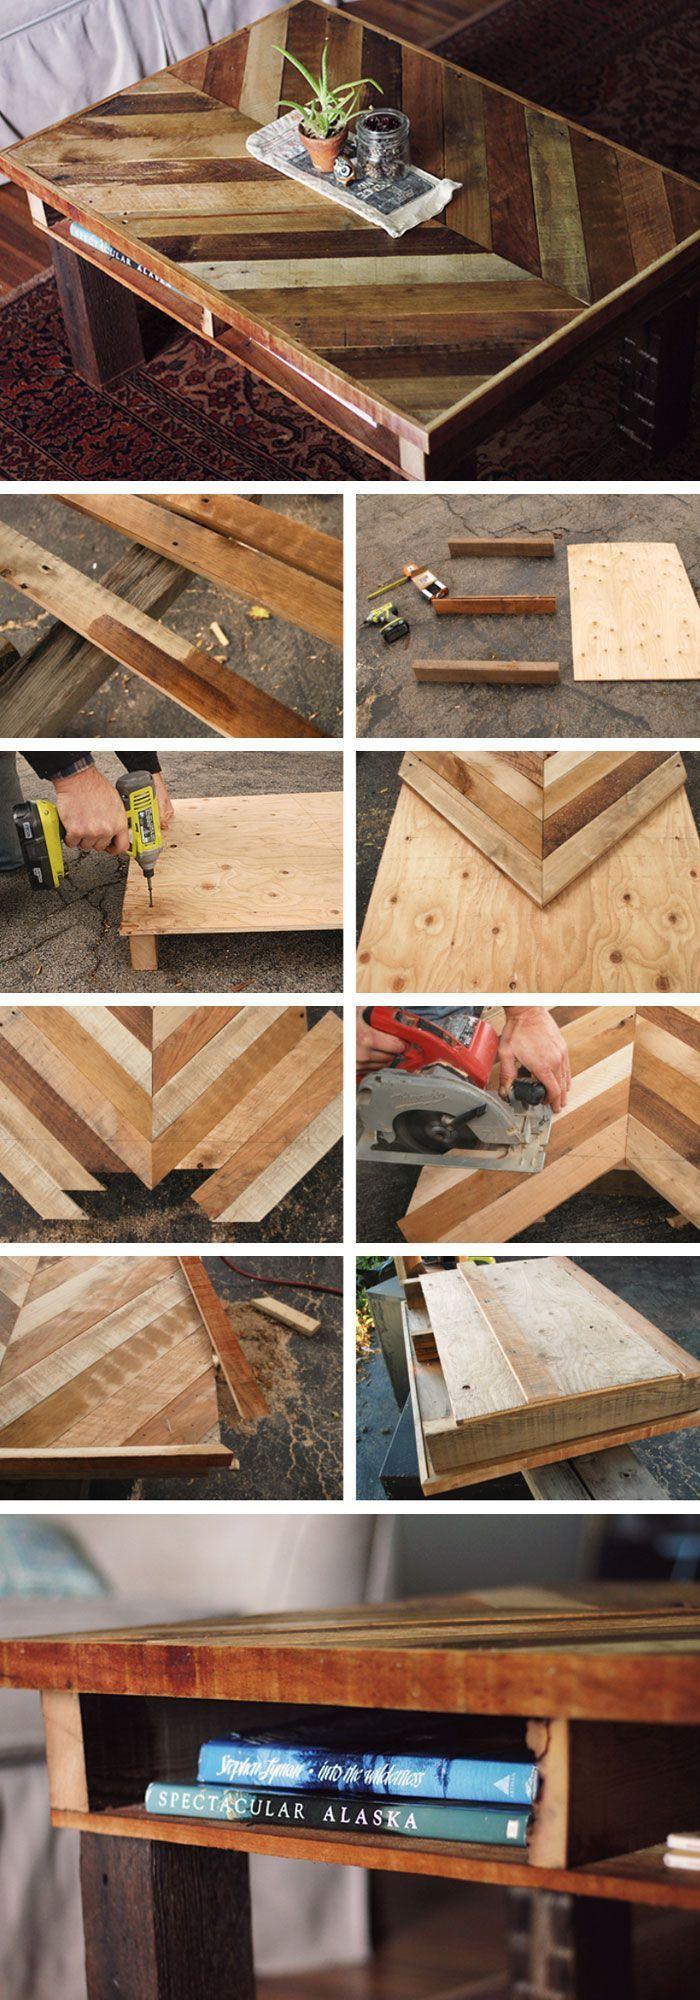 Photo of DIY Pallet Coffee Table | DIY #Home #Decor Ideas on a Budget | DIY #Home Decorat…